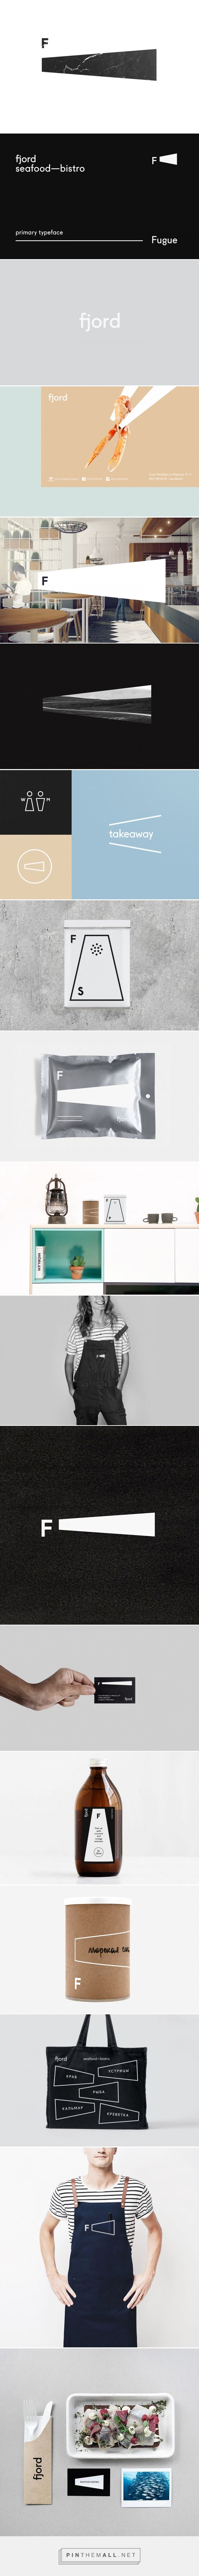 Best 25+ Cafe branding ideas on Pinterest | Cool stationery, Coffe ...